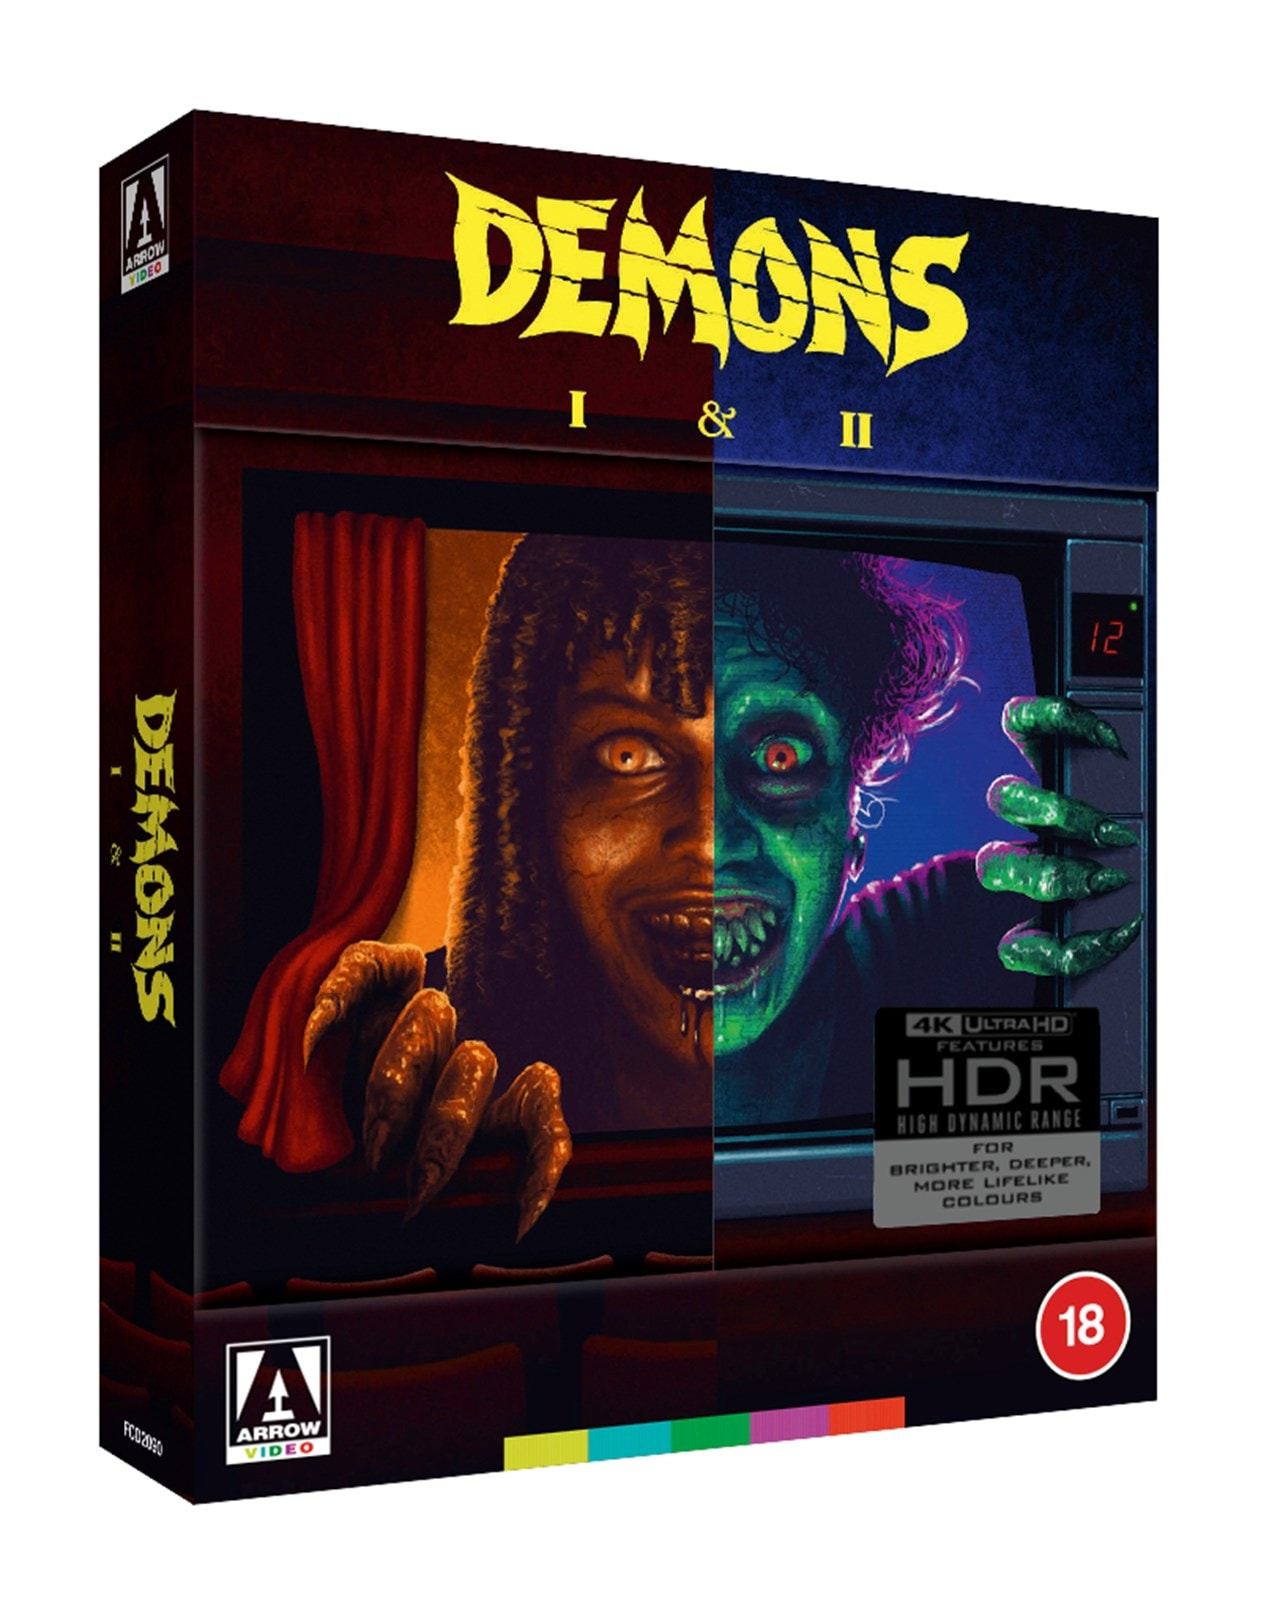 Demons/Demons 2 - 3